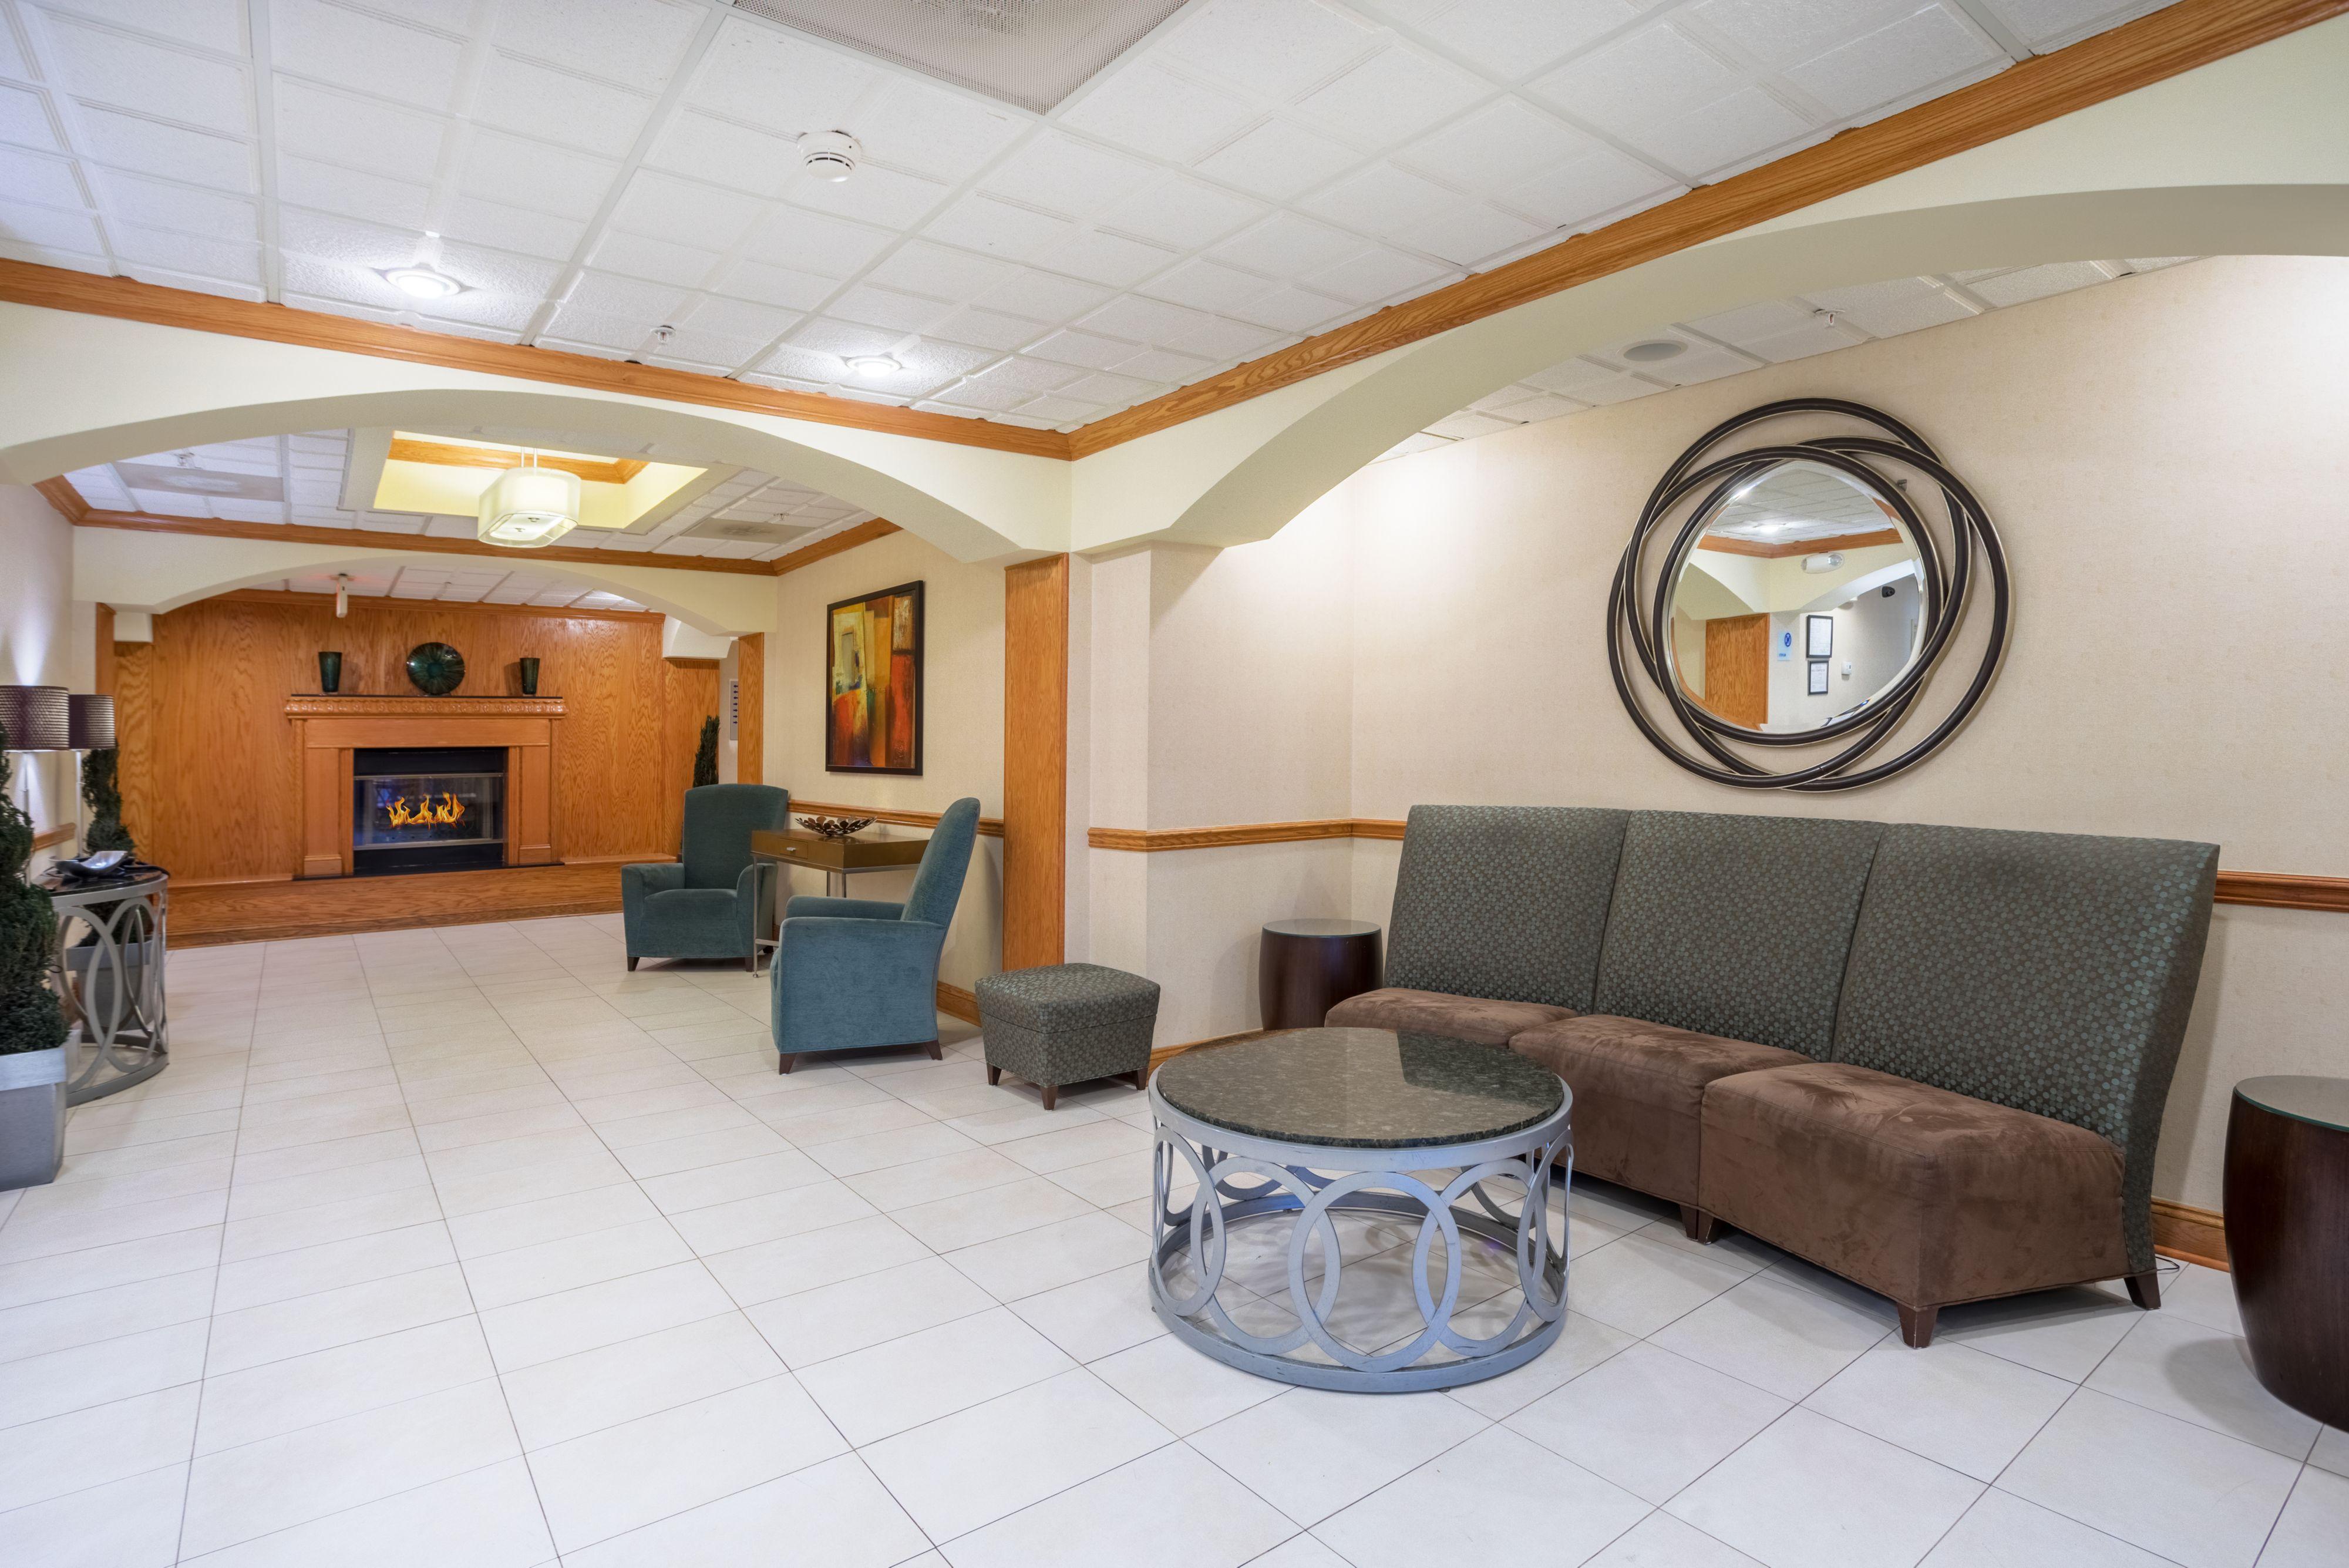 Holiday Inn Express & Suites Woodbridge image 4